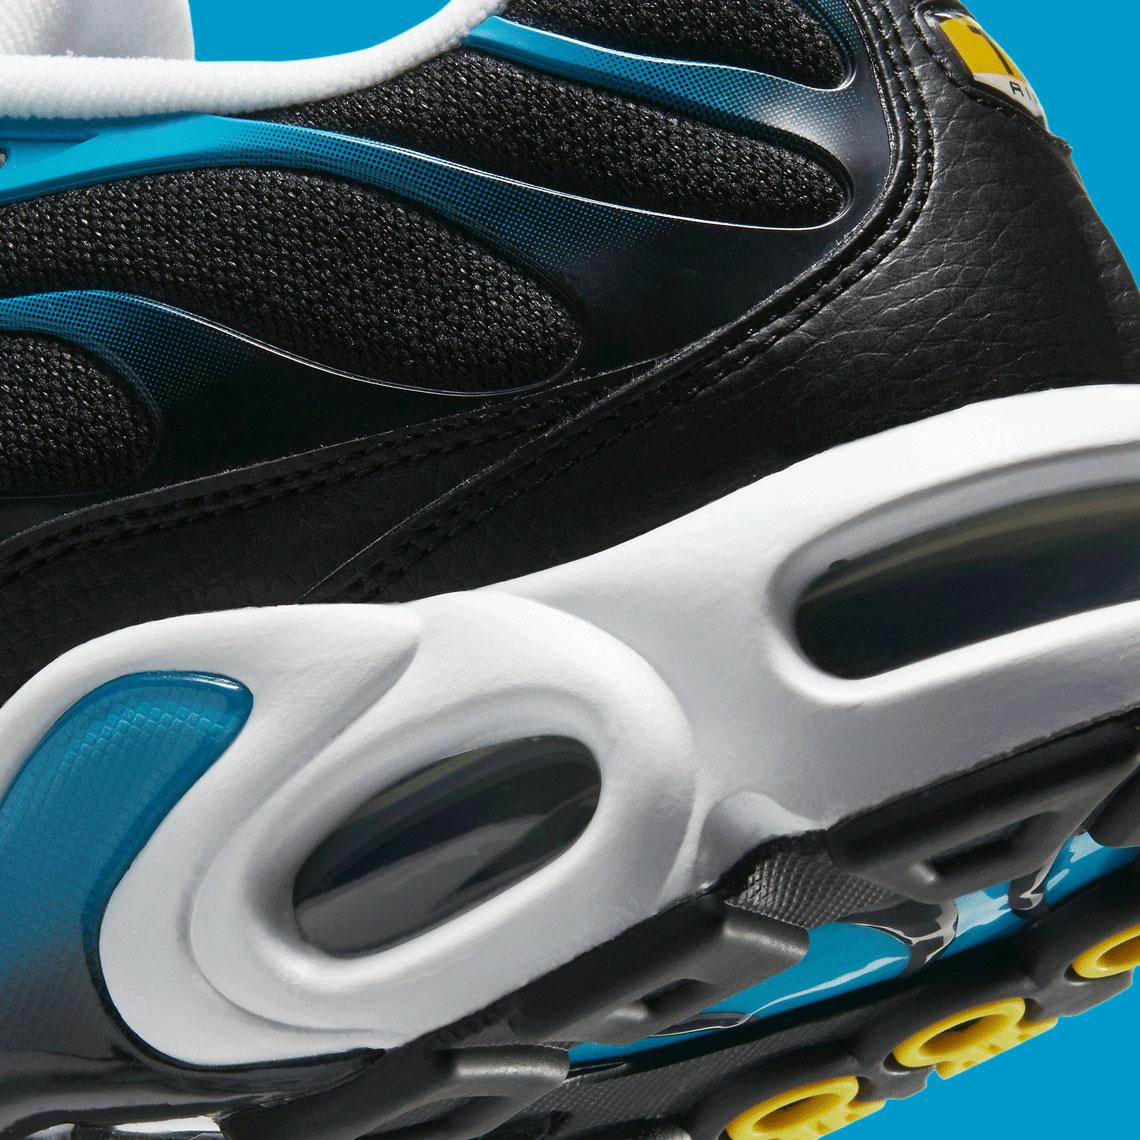 nike-air-max-plus-black-laser-blue-release-date-price-8